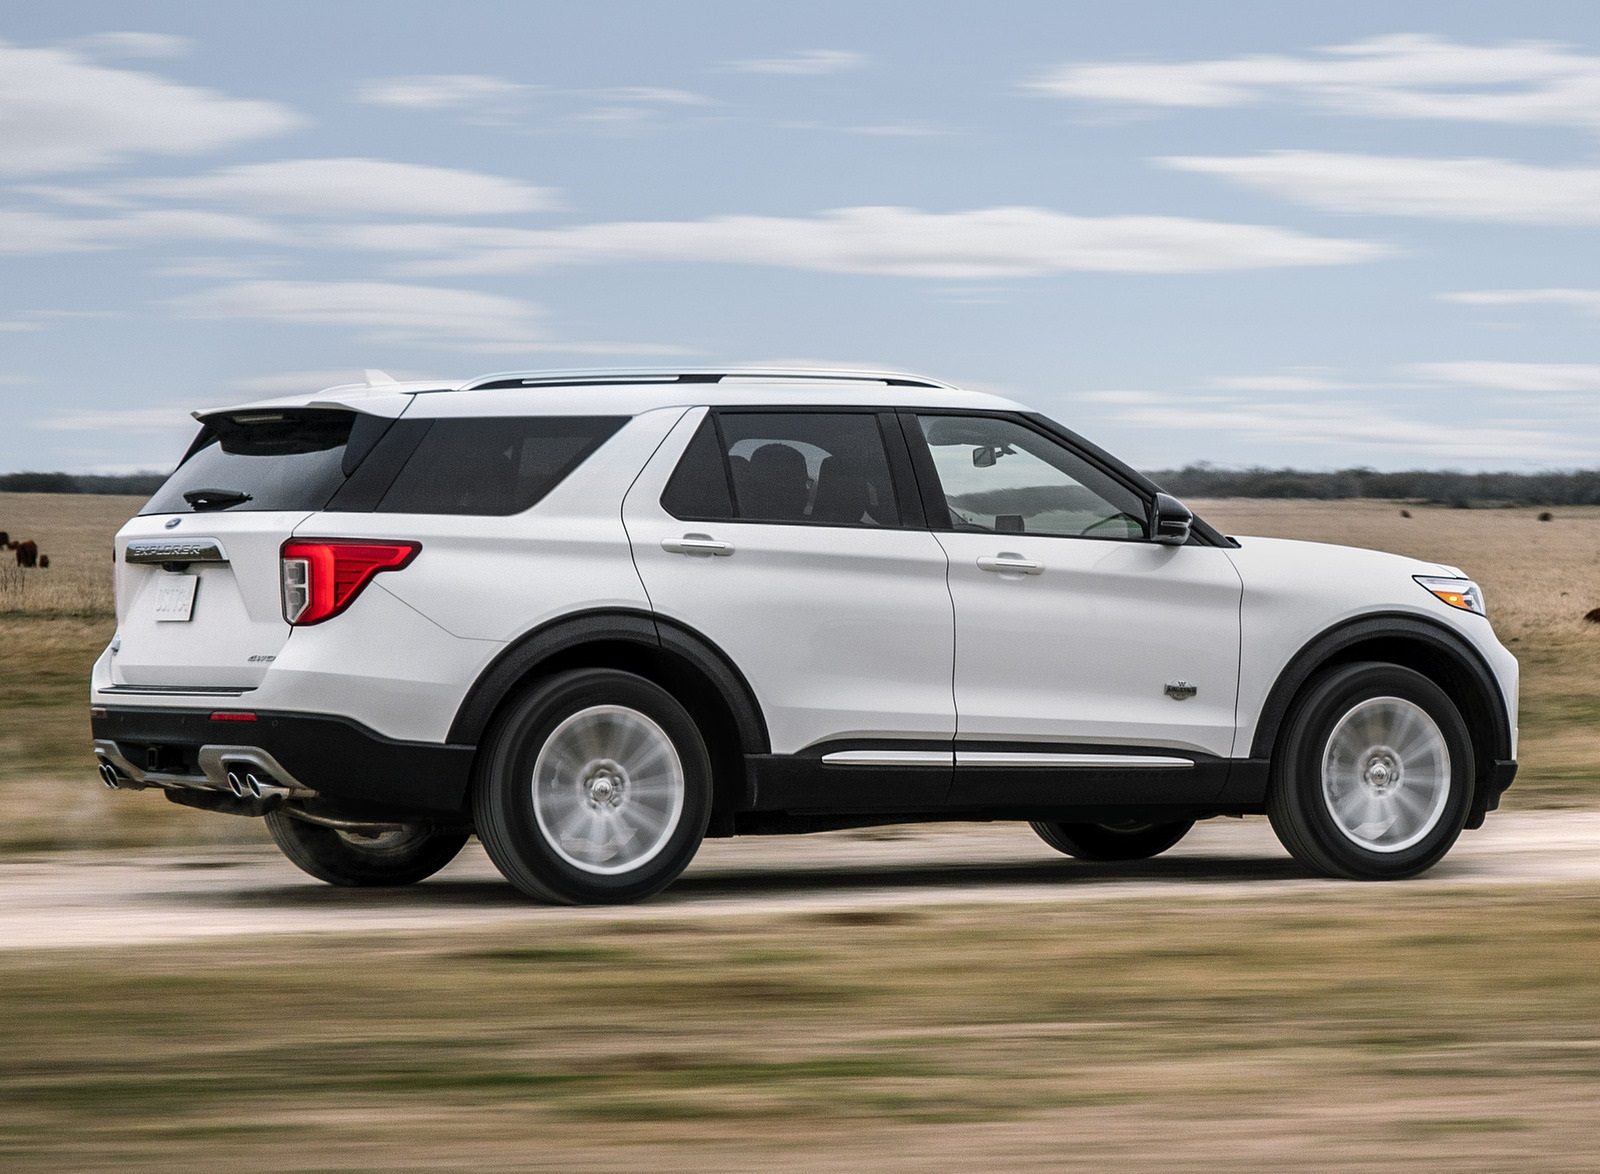 2021 Ford Explorer King Ranch Rear Three-Quarter Wallpapers (4)